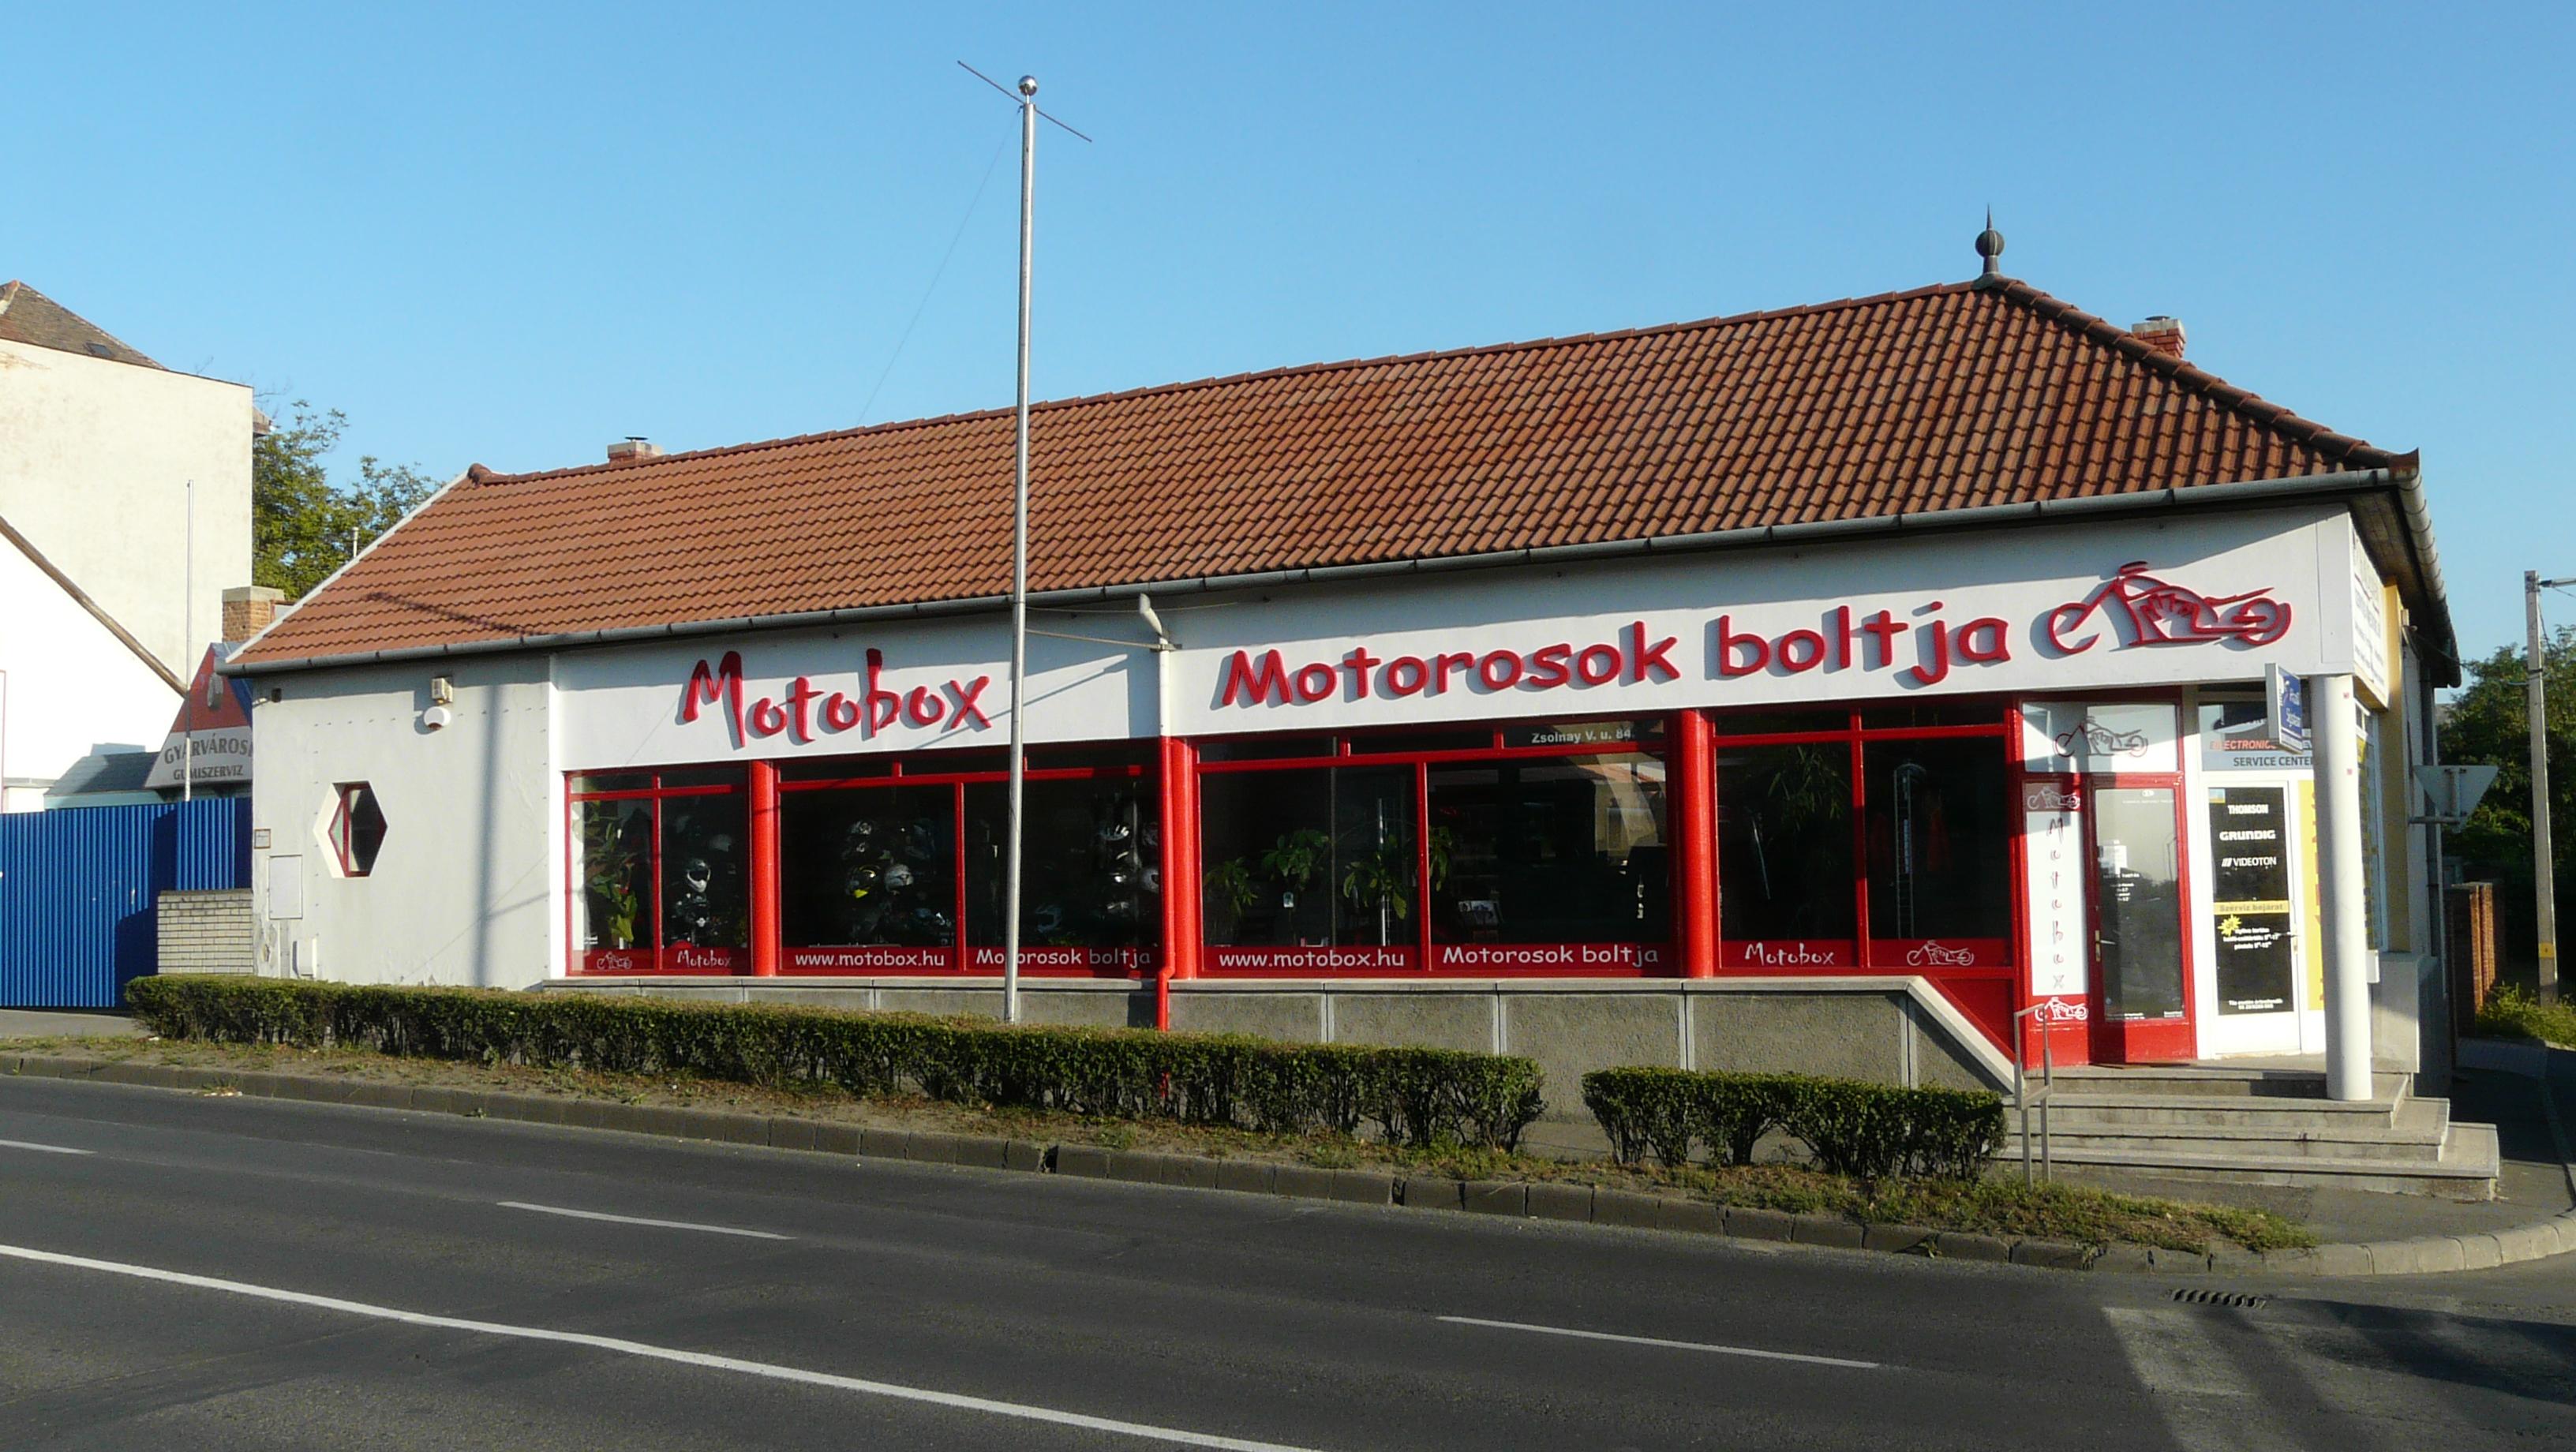 Motobox Motorosok boltja